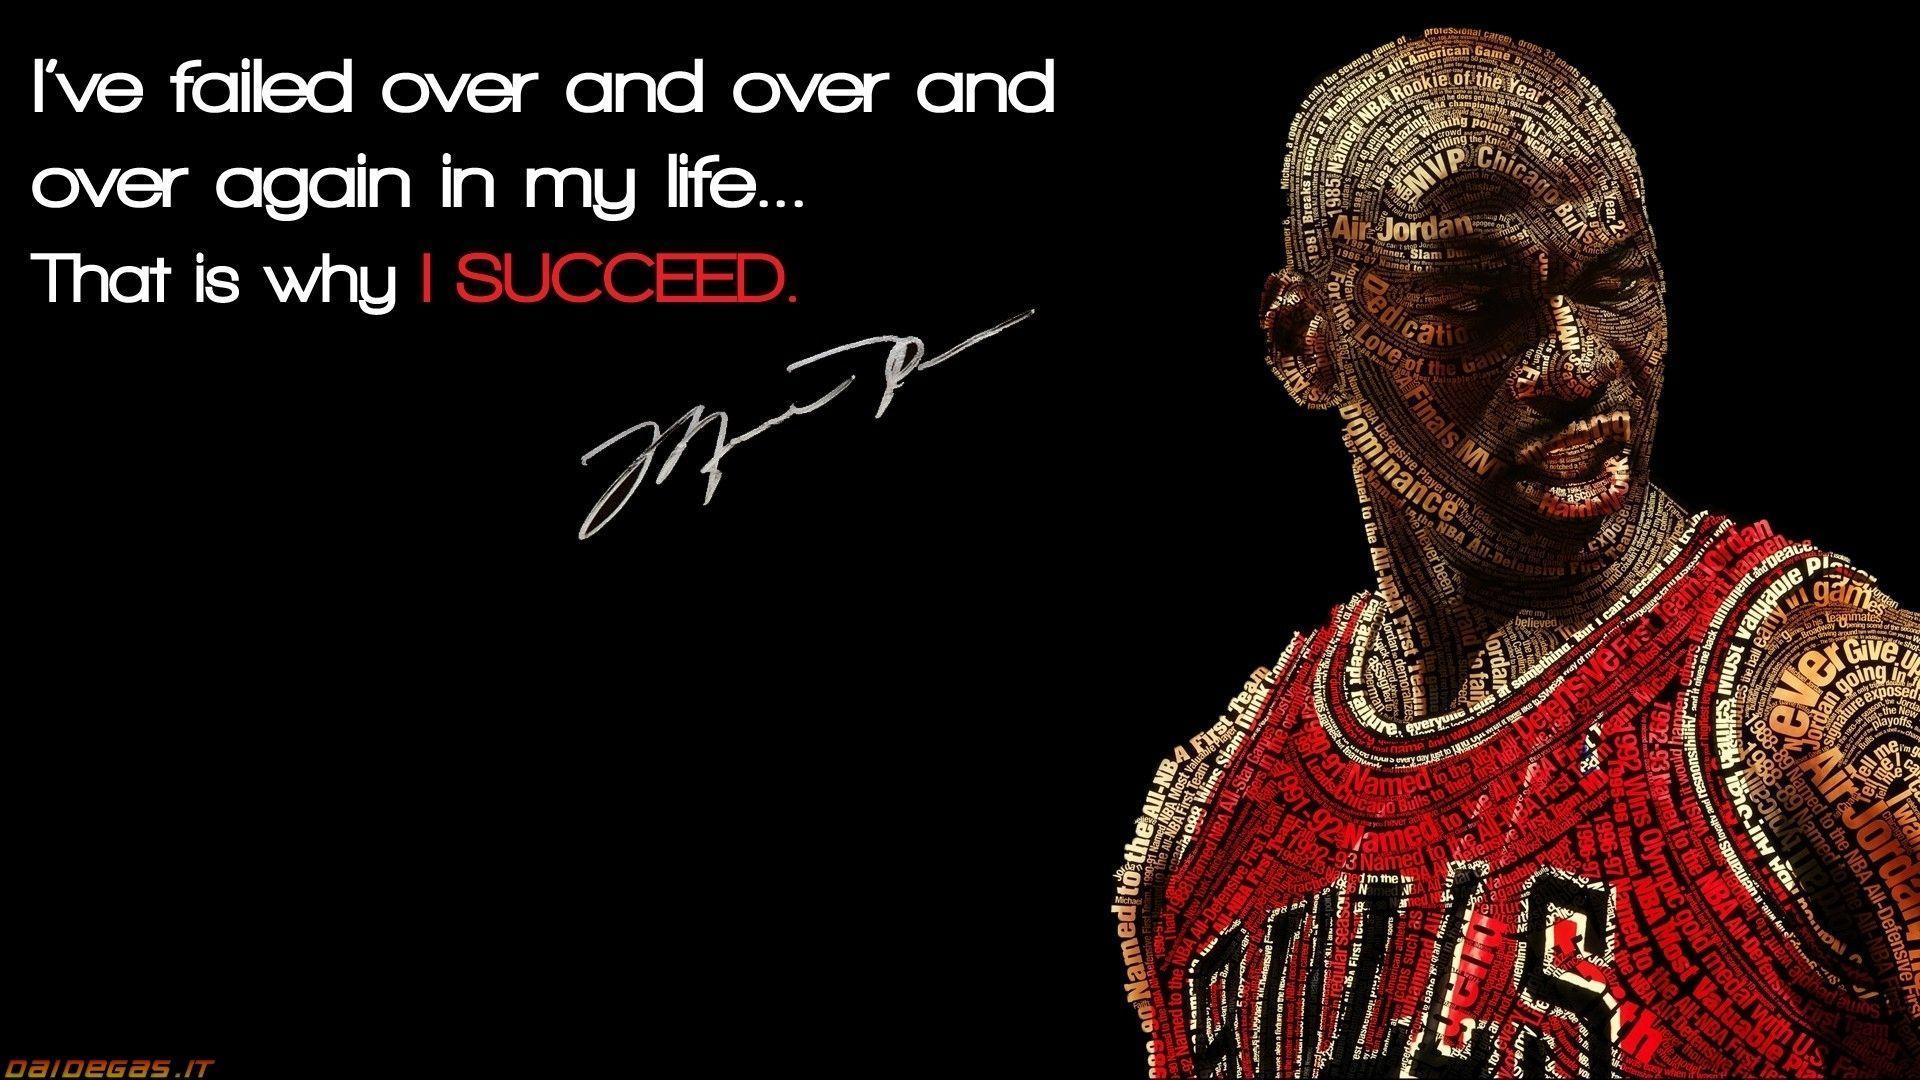 Jordan Peterson Wallpaper Quote Cool Basketball Wallpapers Wallpaper Cave